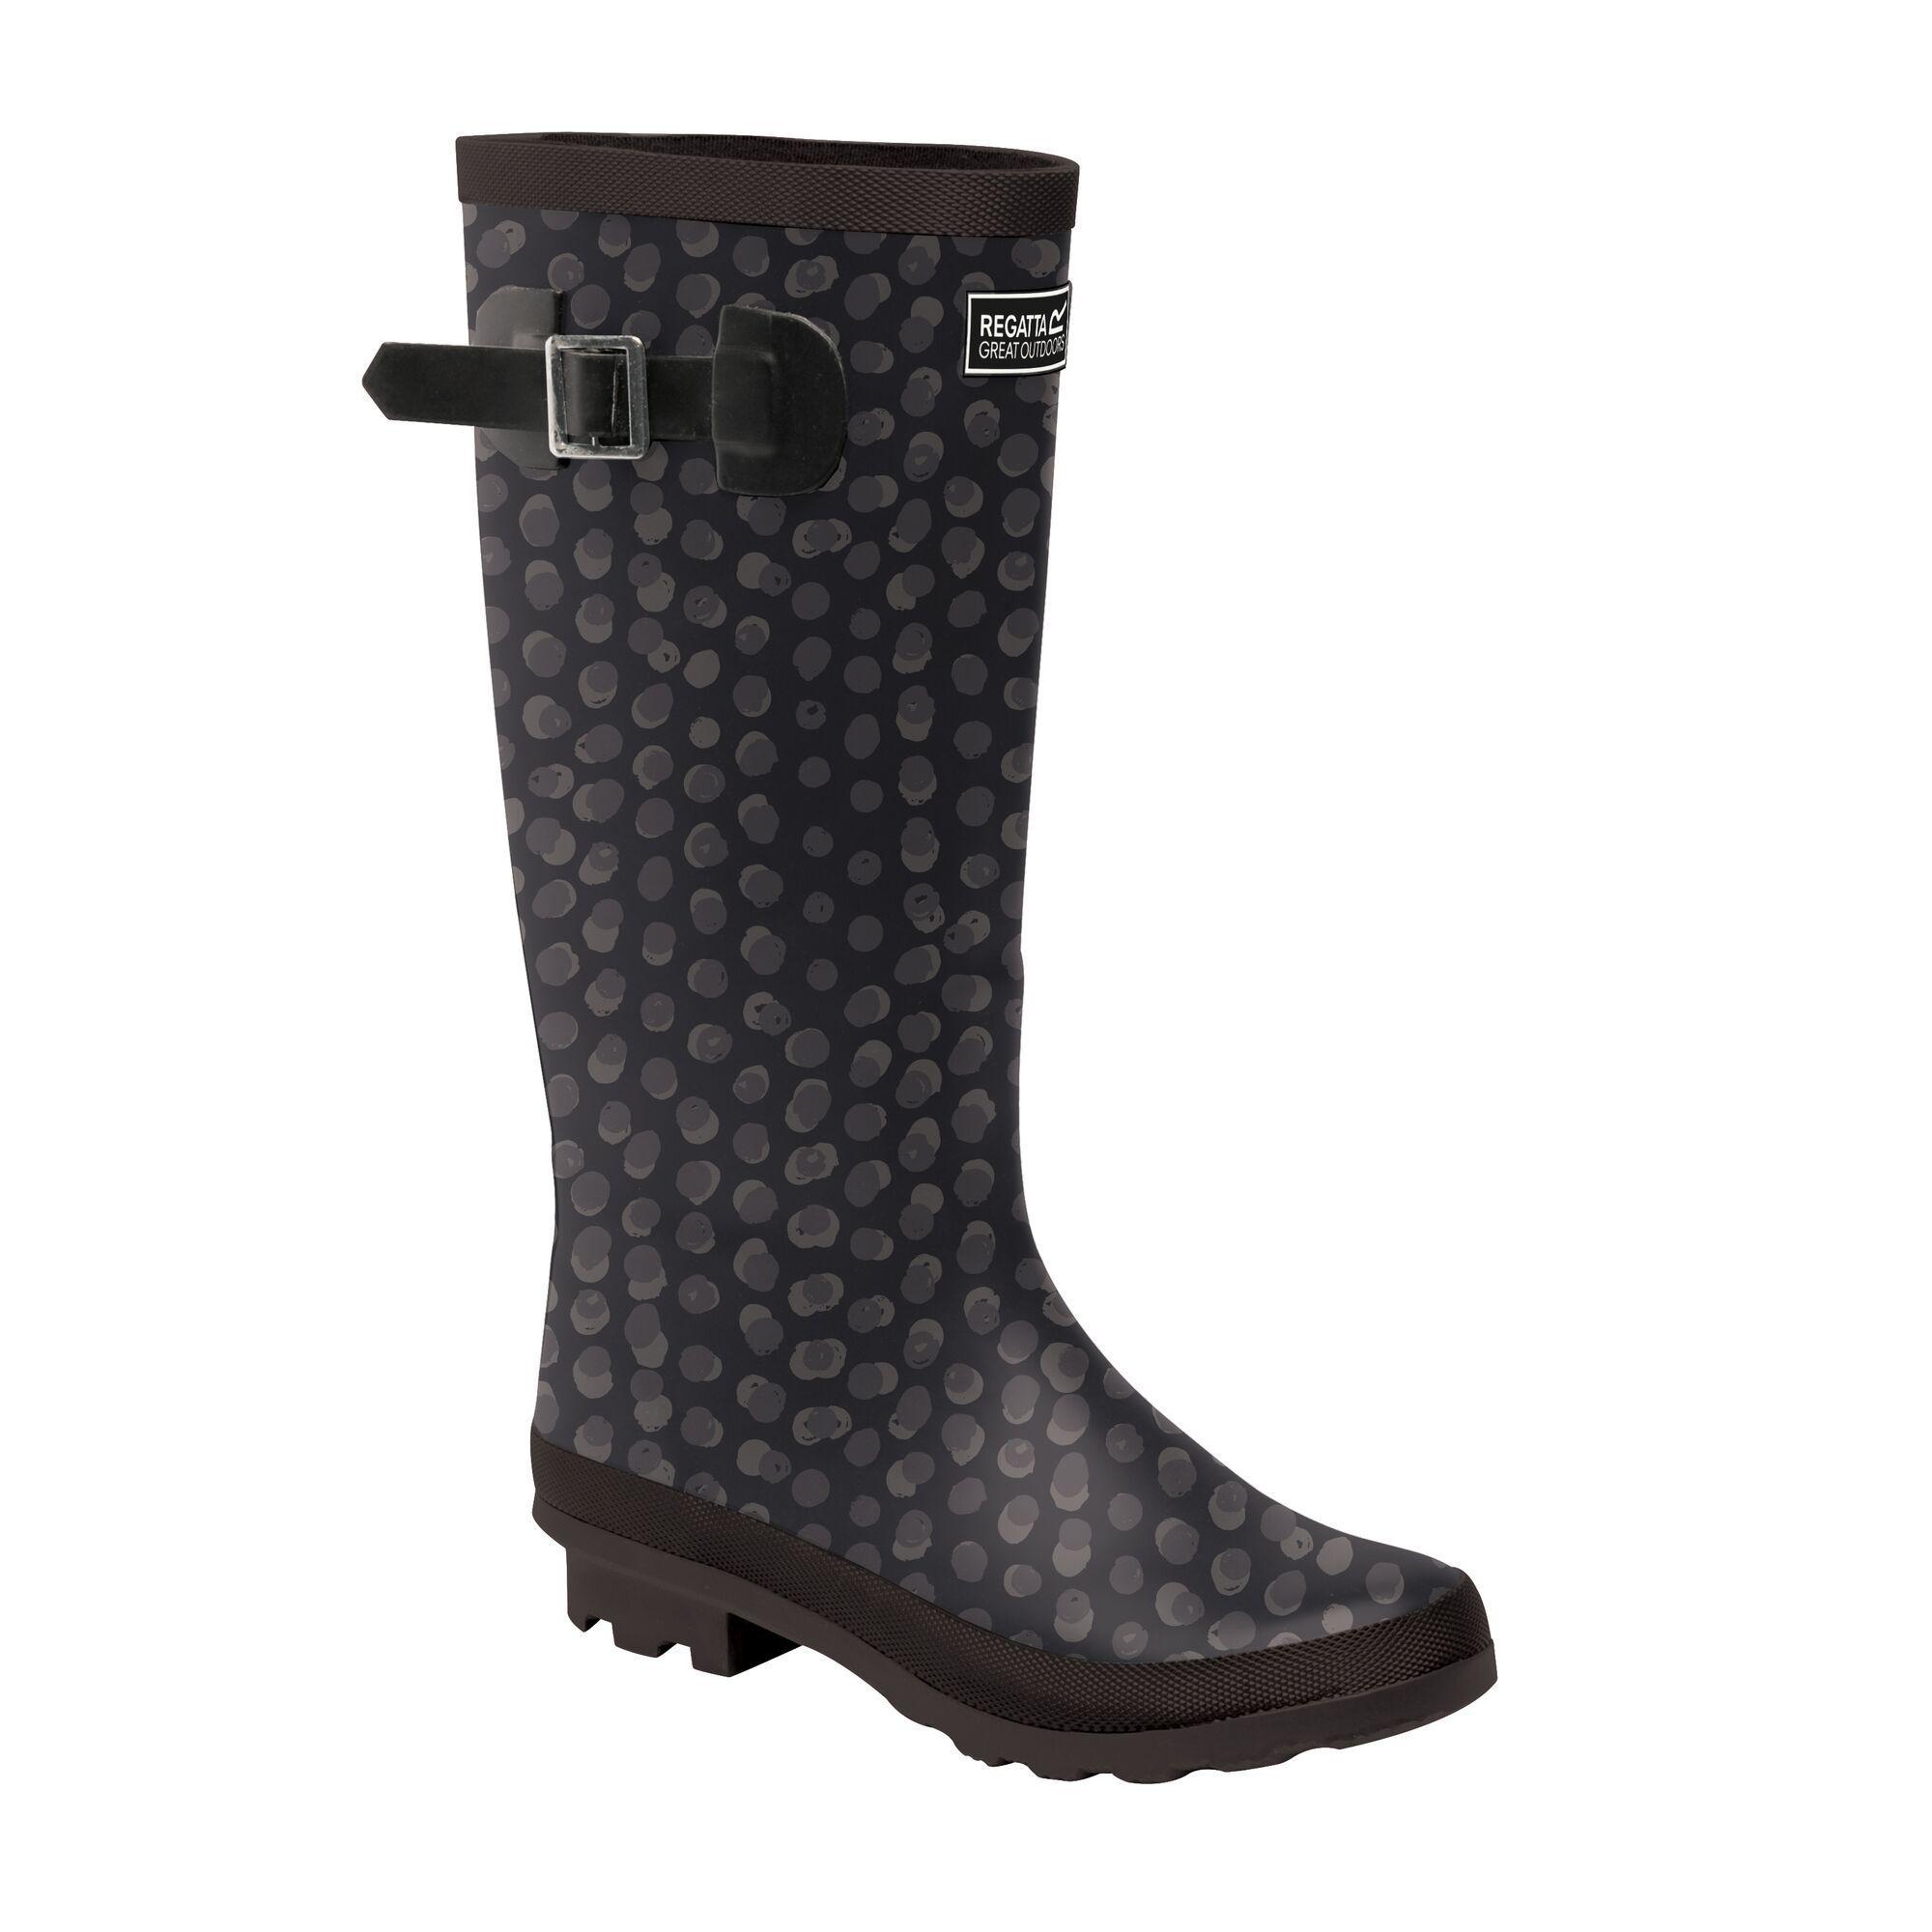 Regatta Womens/Ladies Ly Fairweather II Tall Durable Wellington Boots (Black Print)